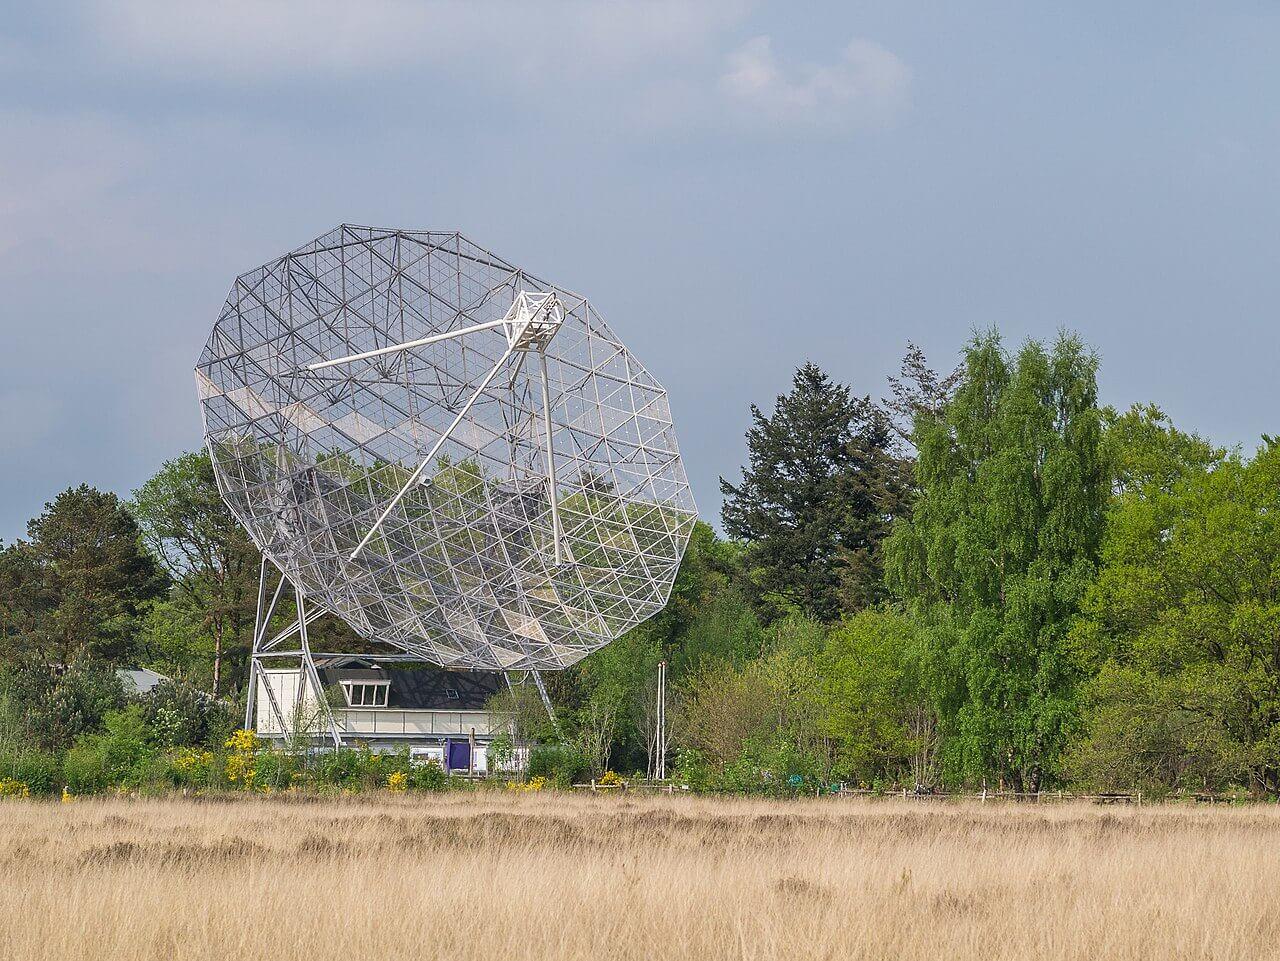 Dwingleloo Satellite Antenna in the Netherlands